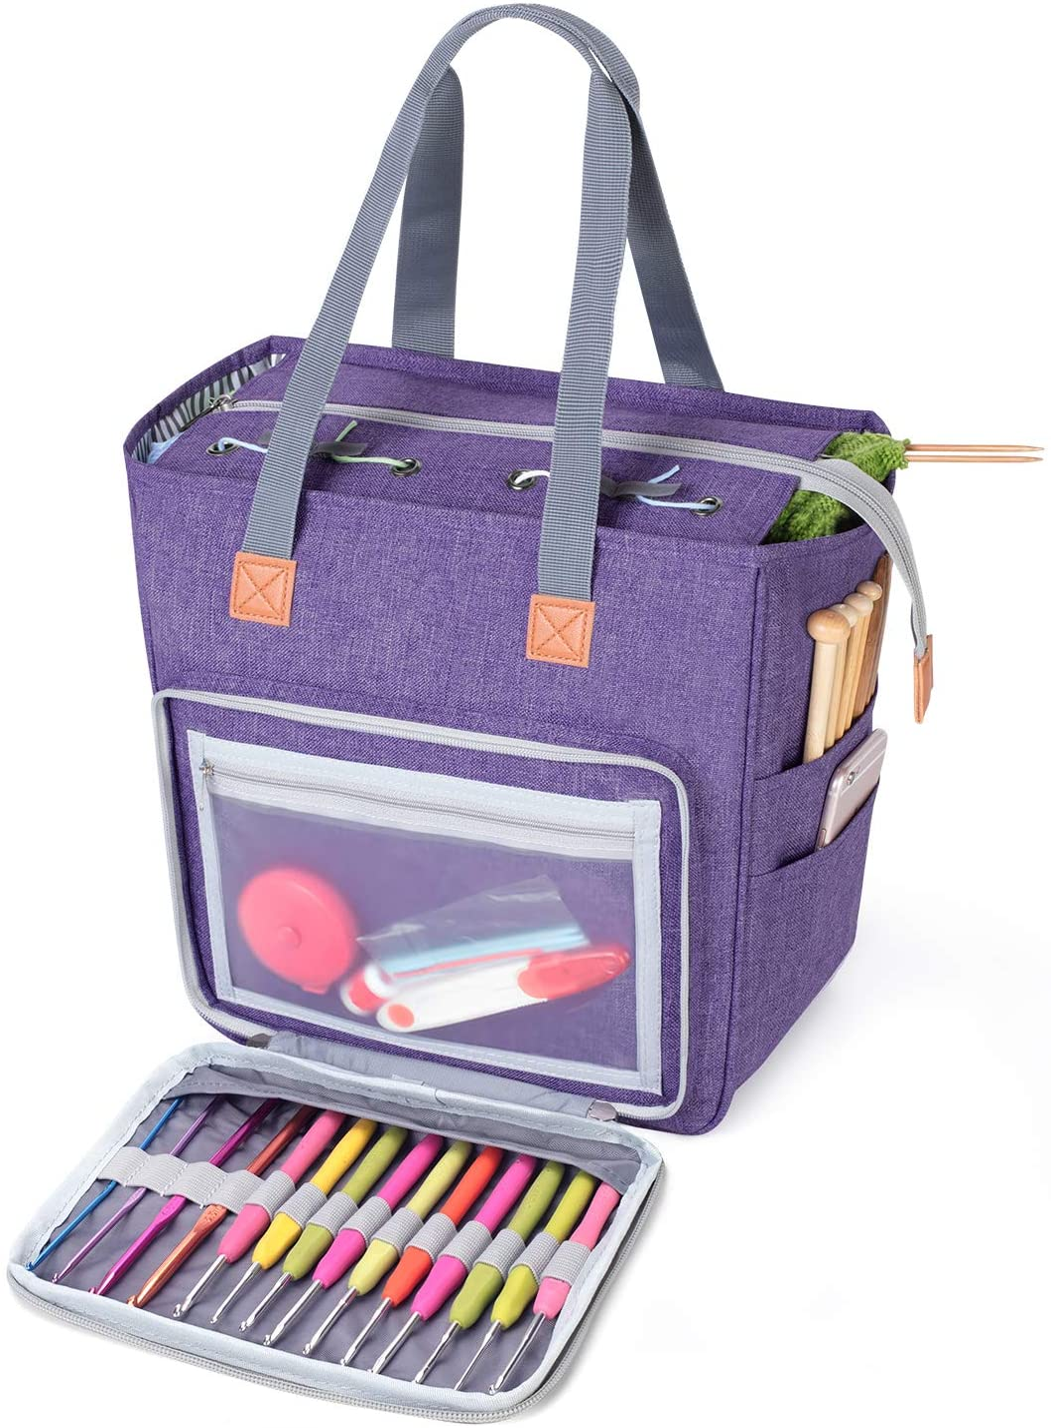 Small Knitting Crochet Craft Zippered Project Bag